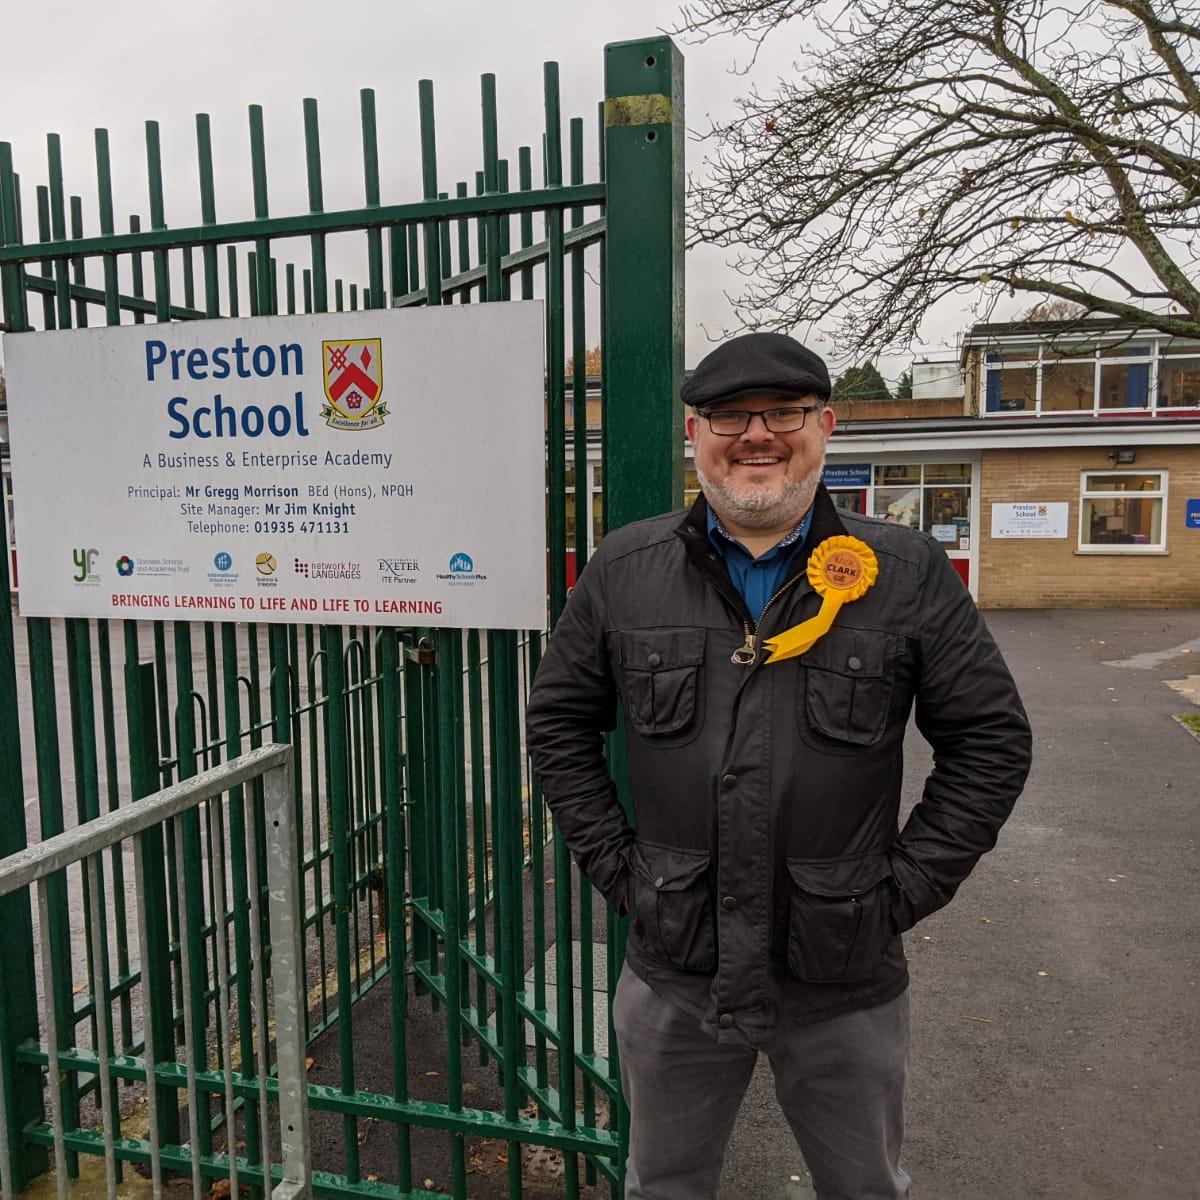 Mick Clark outside his old school, Preston School